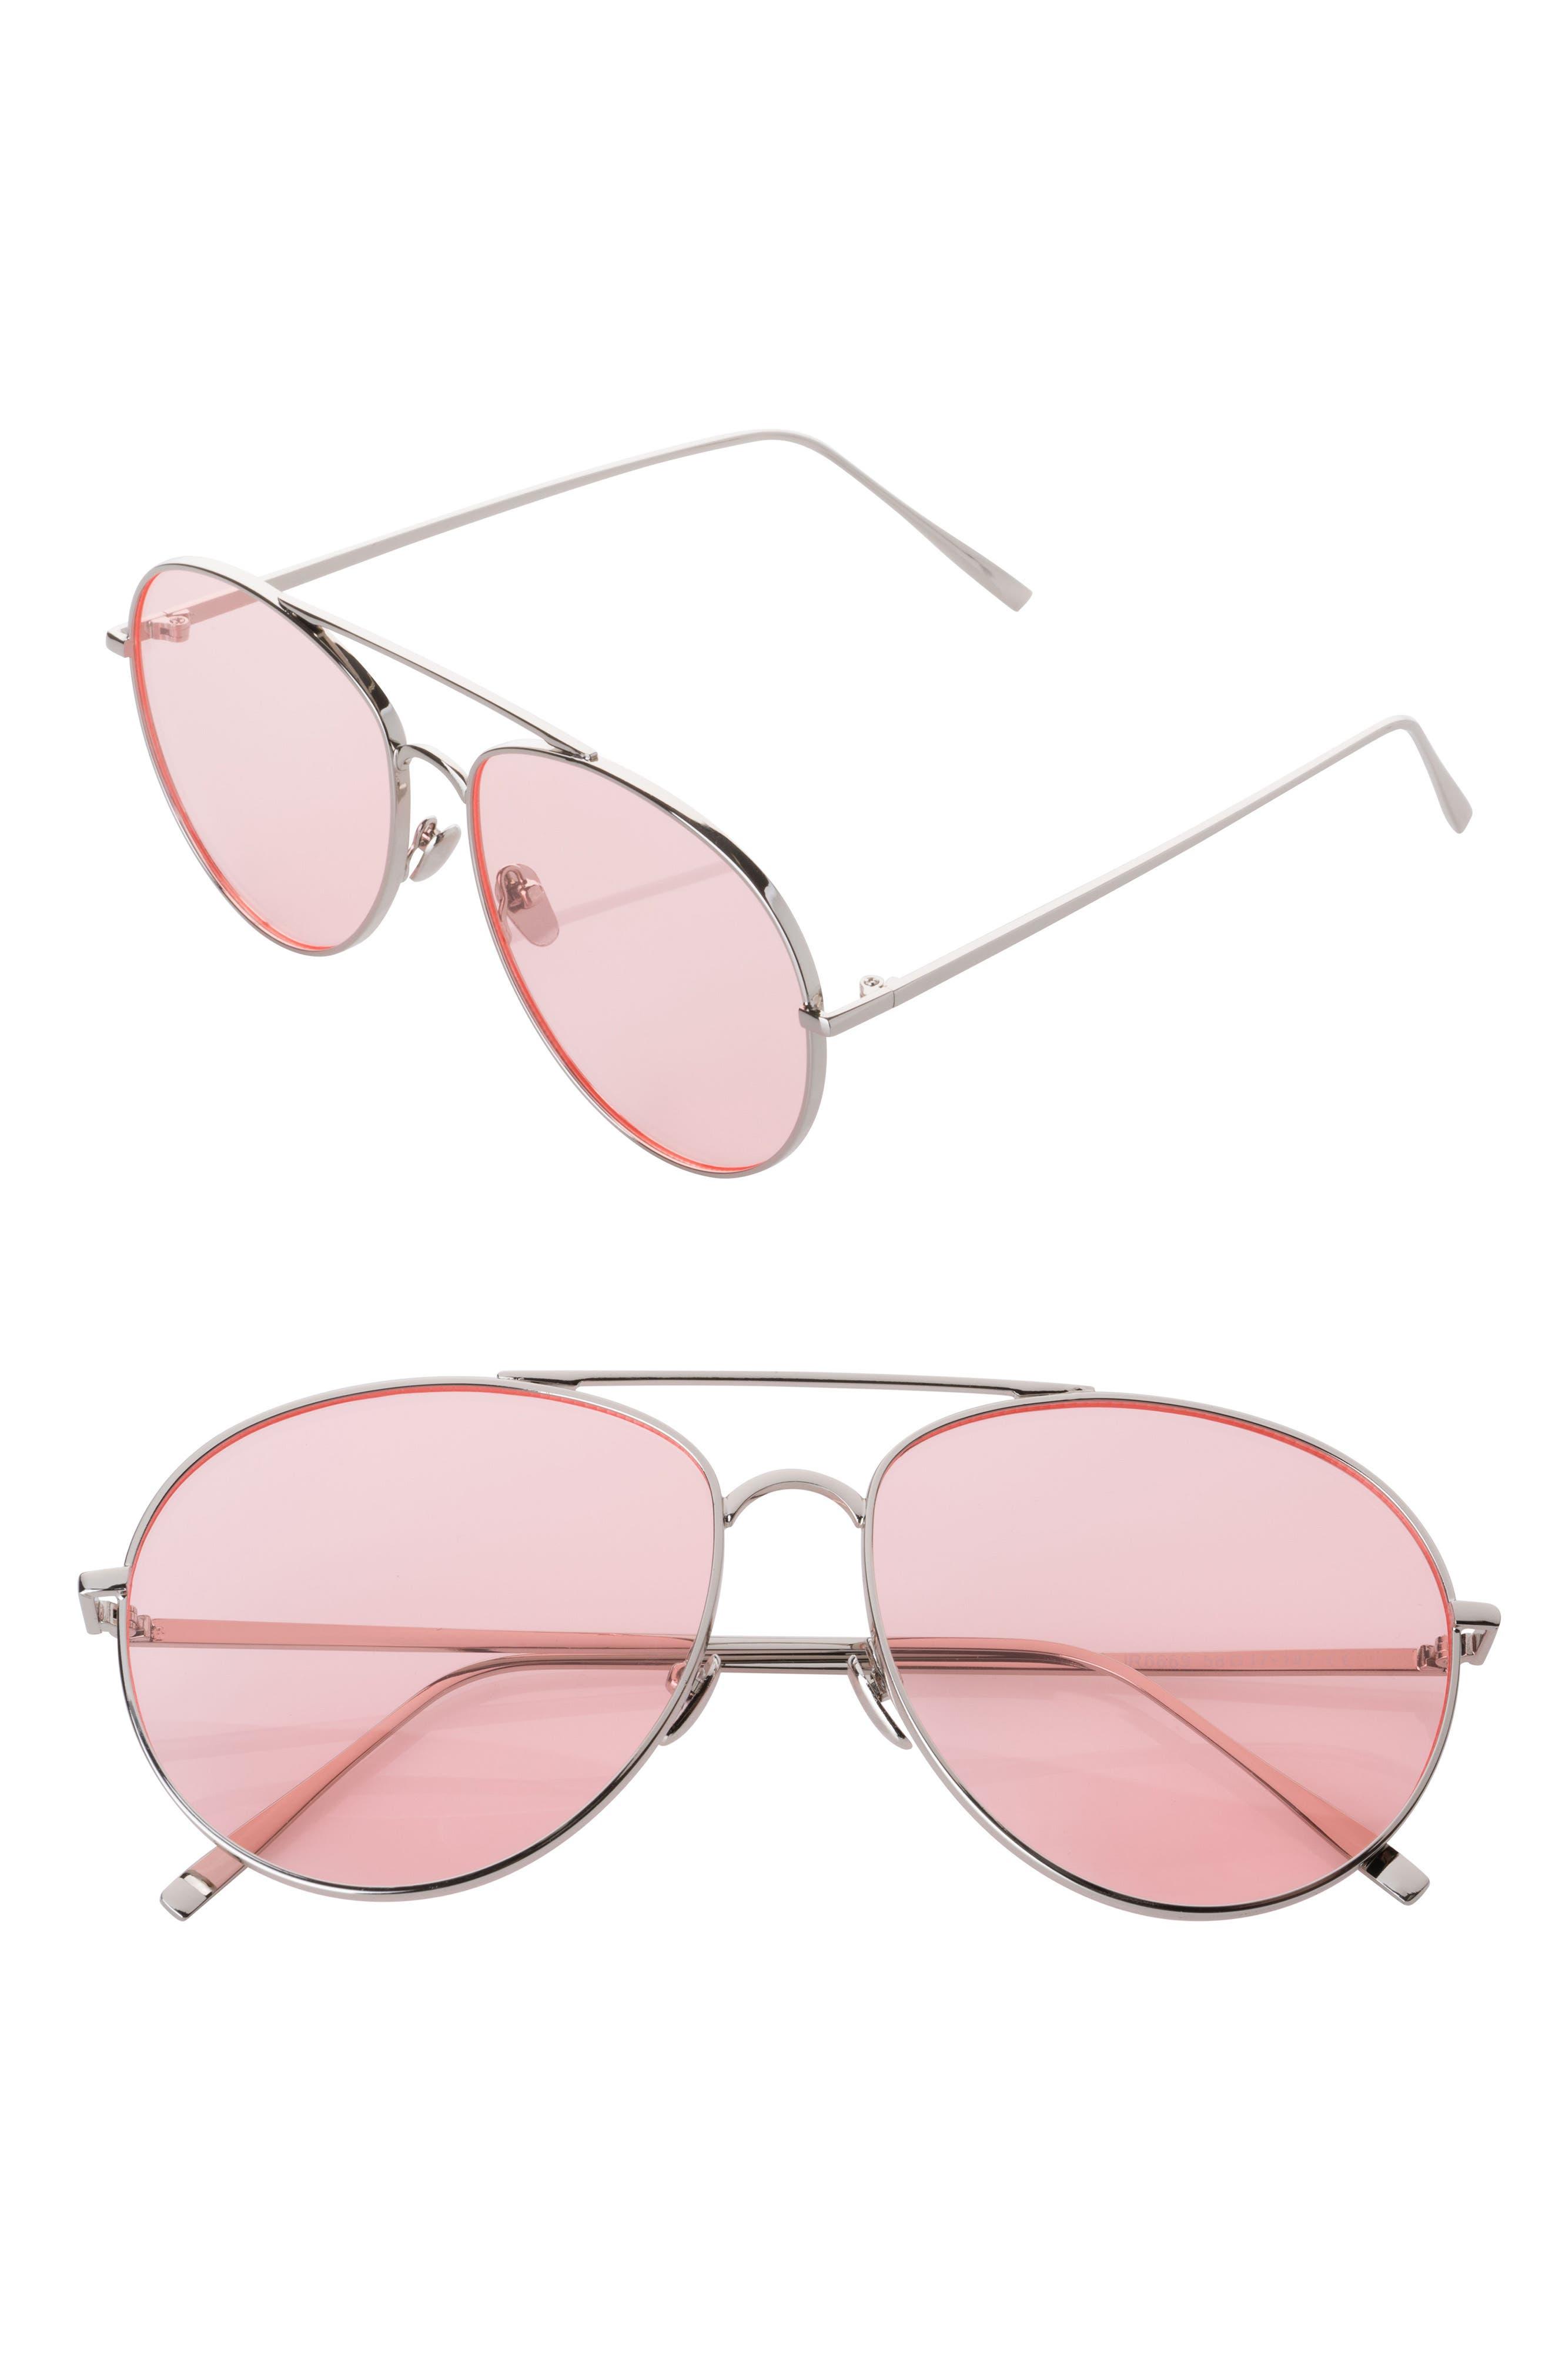 58mm Aviator Sunglasses,                         Main,                         color, Pink/ Silver